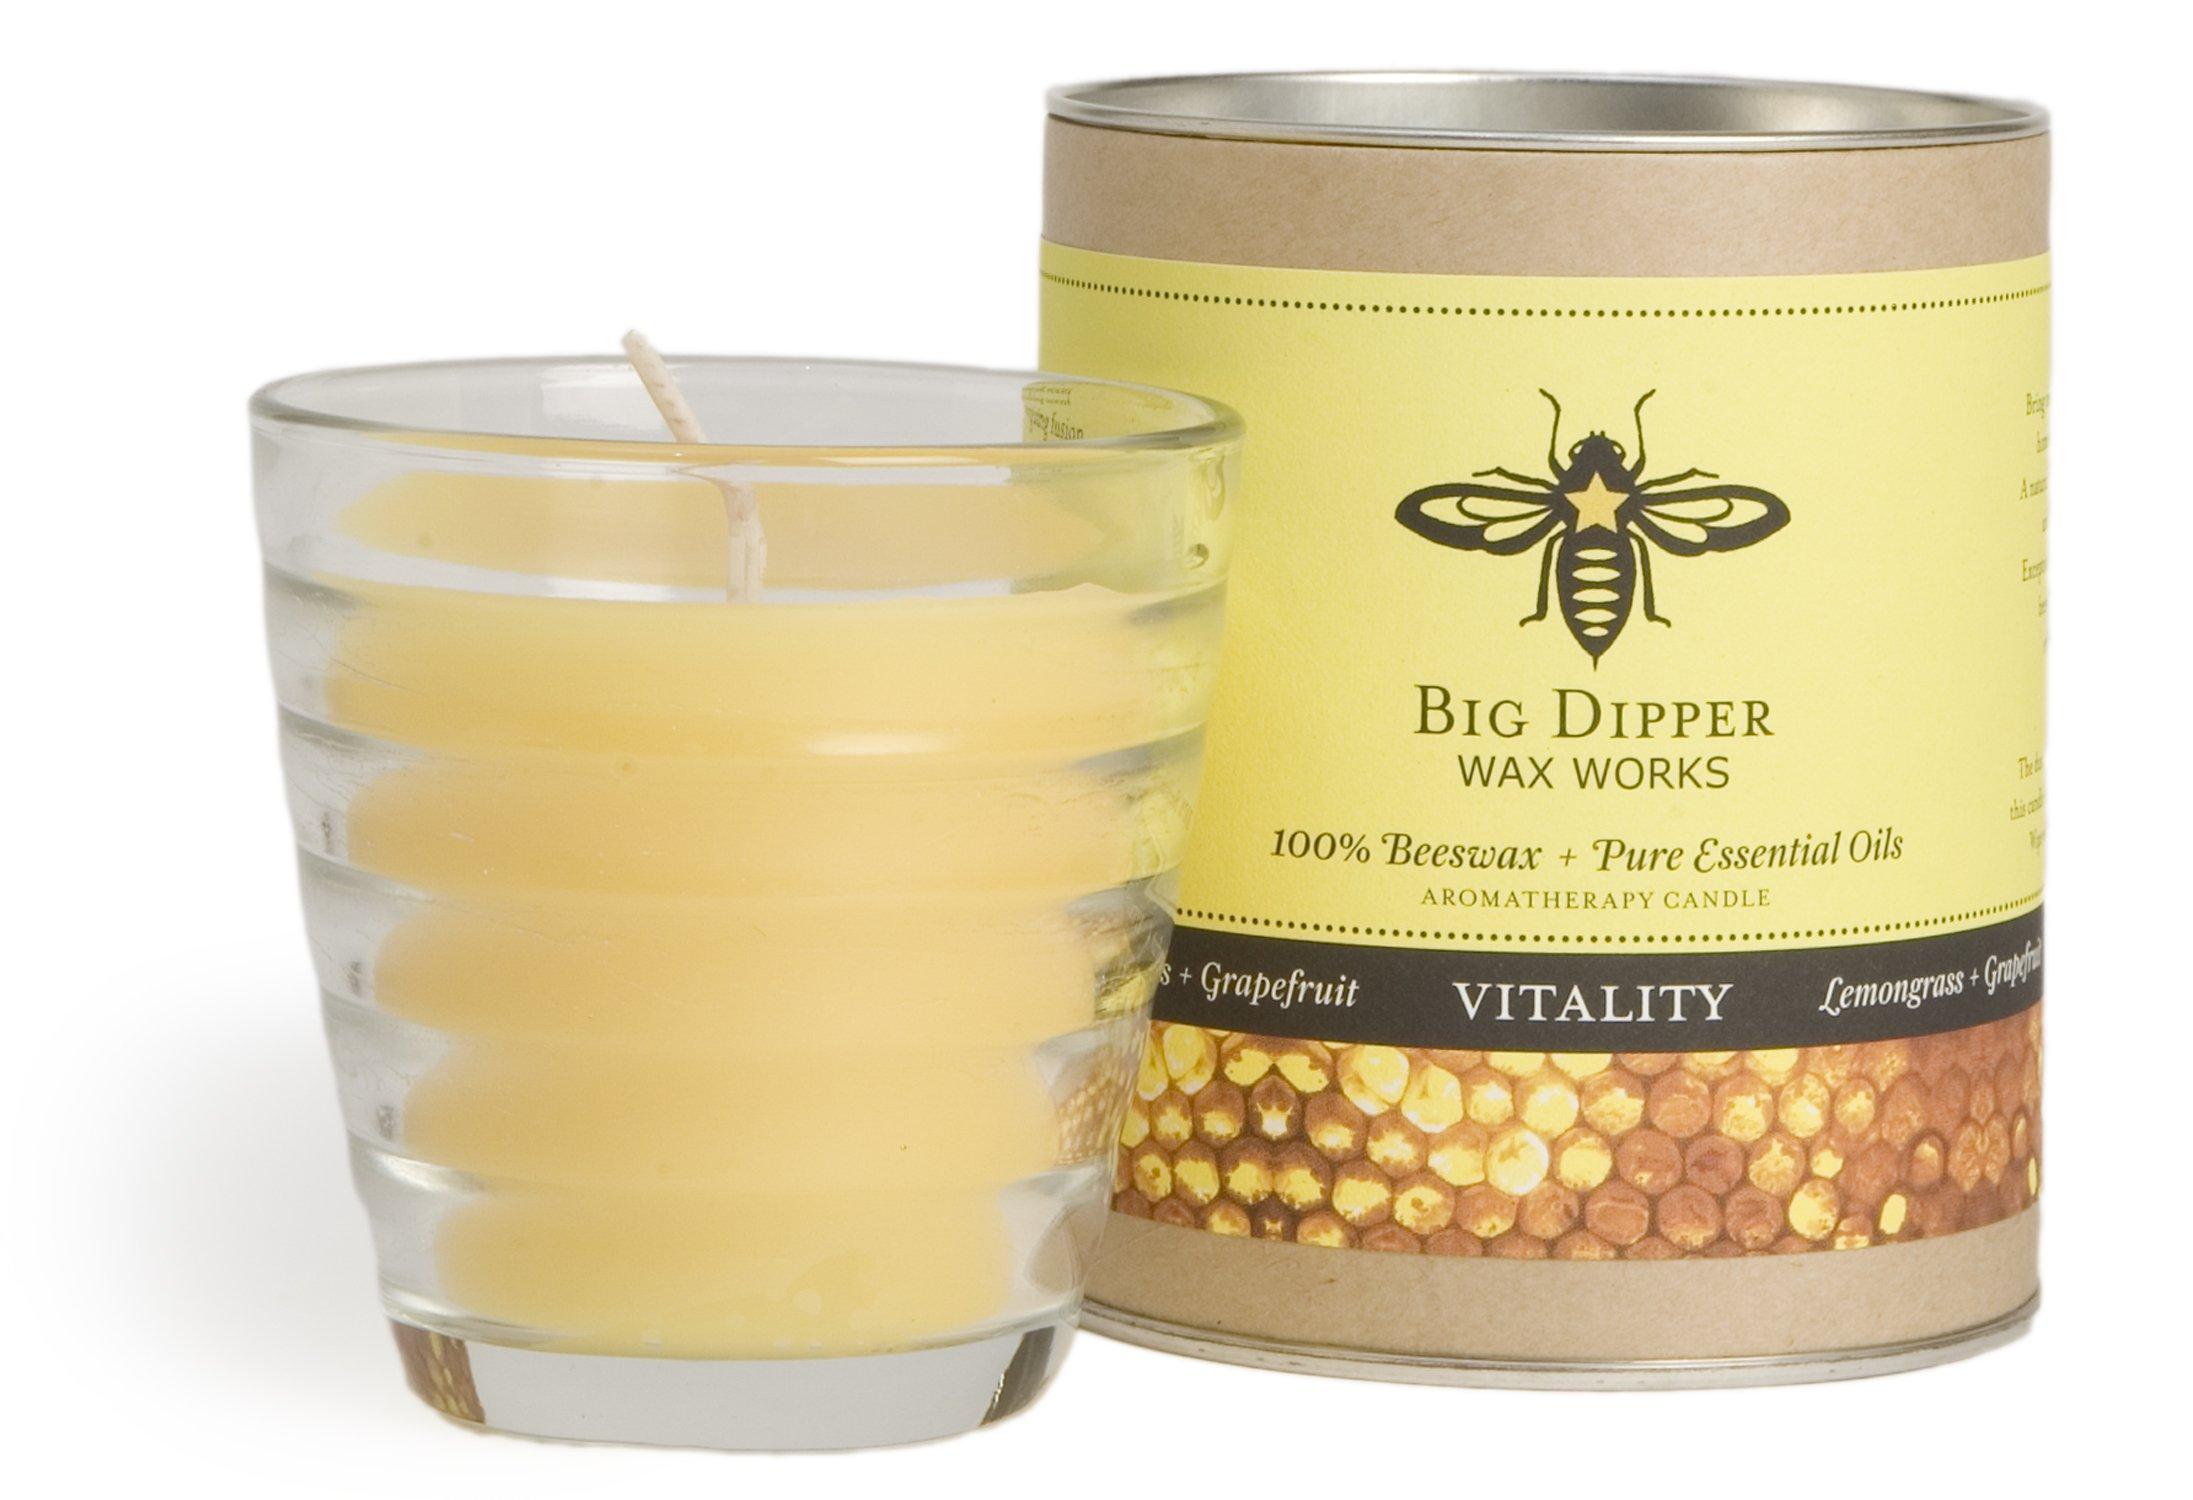 Long-lasting Hand-cast 100% Pure Beeswax Candle, 6 oz. Aromatherapy Beehive Glass - Vitality (Lemongrass-Grapefruit)